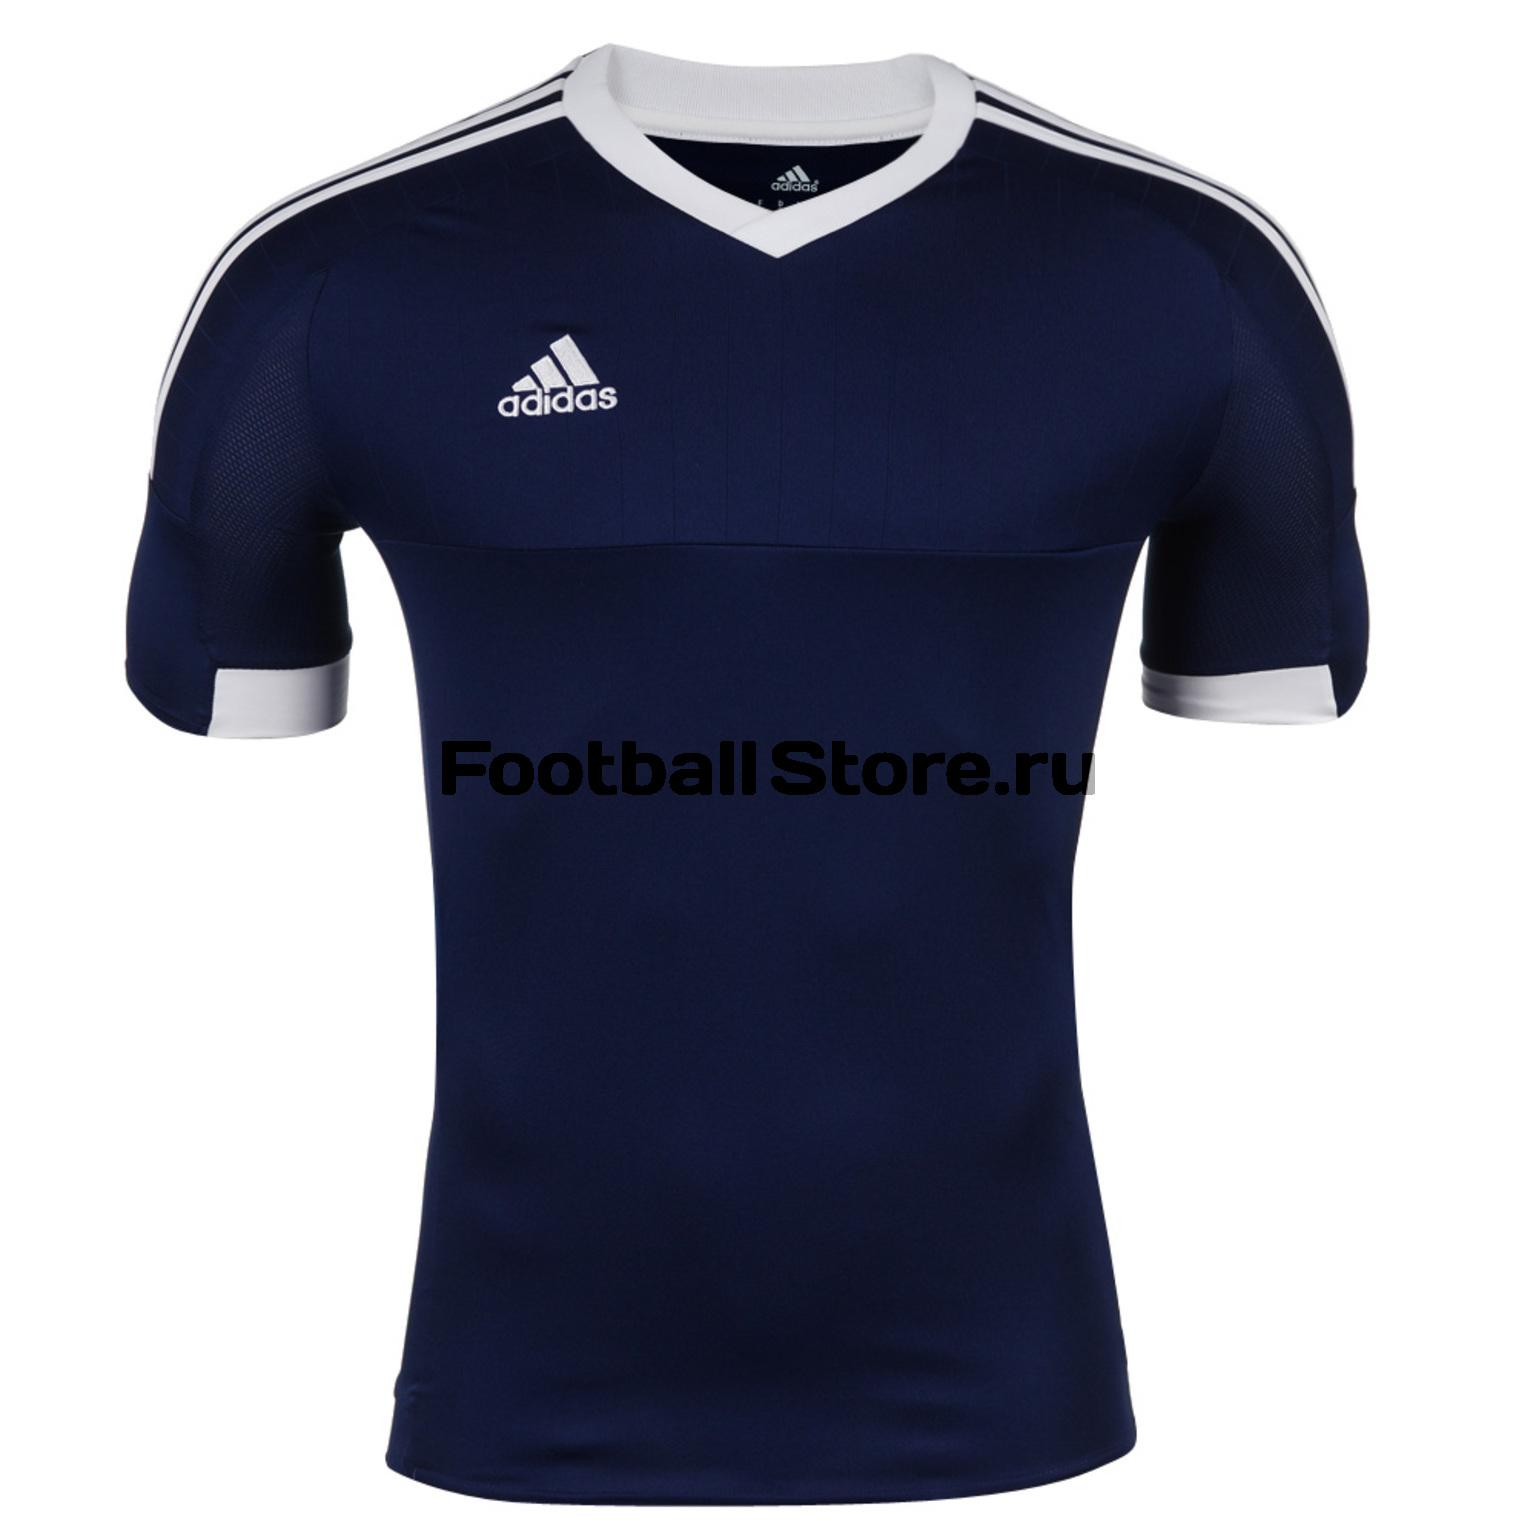 Футболка Adidas Tiro 15 JSY 15 S22365